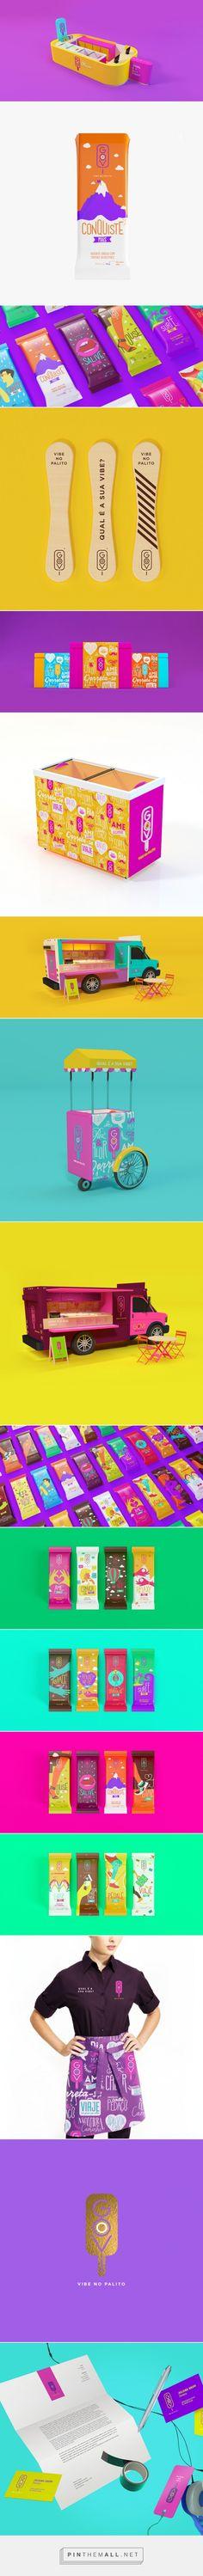 Goovi #BrazilianPaletas #packaging designed by Isabela Rodrigues